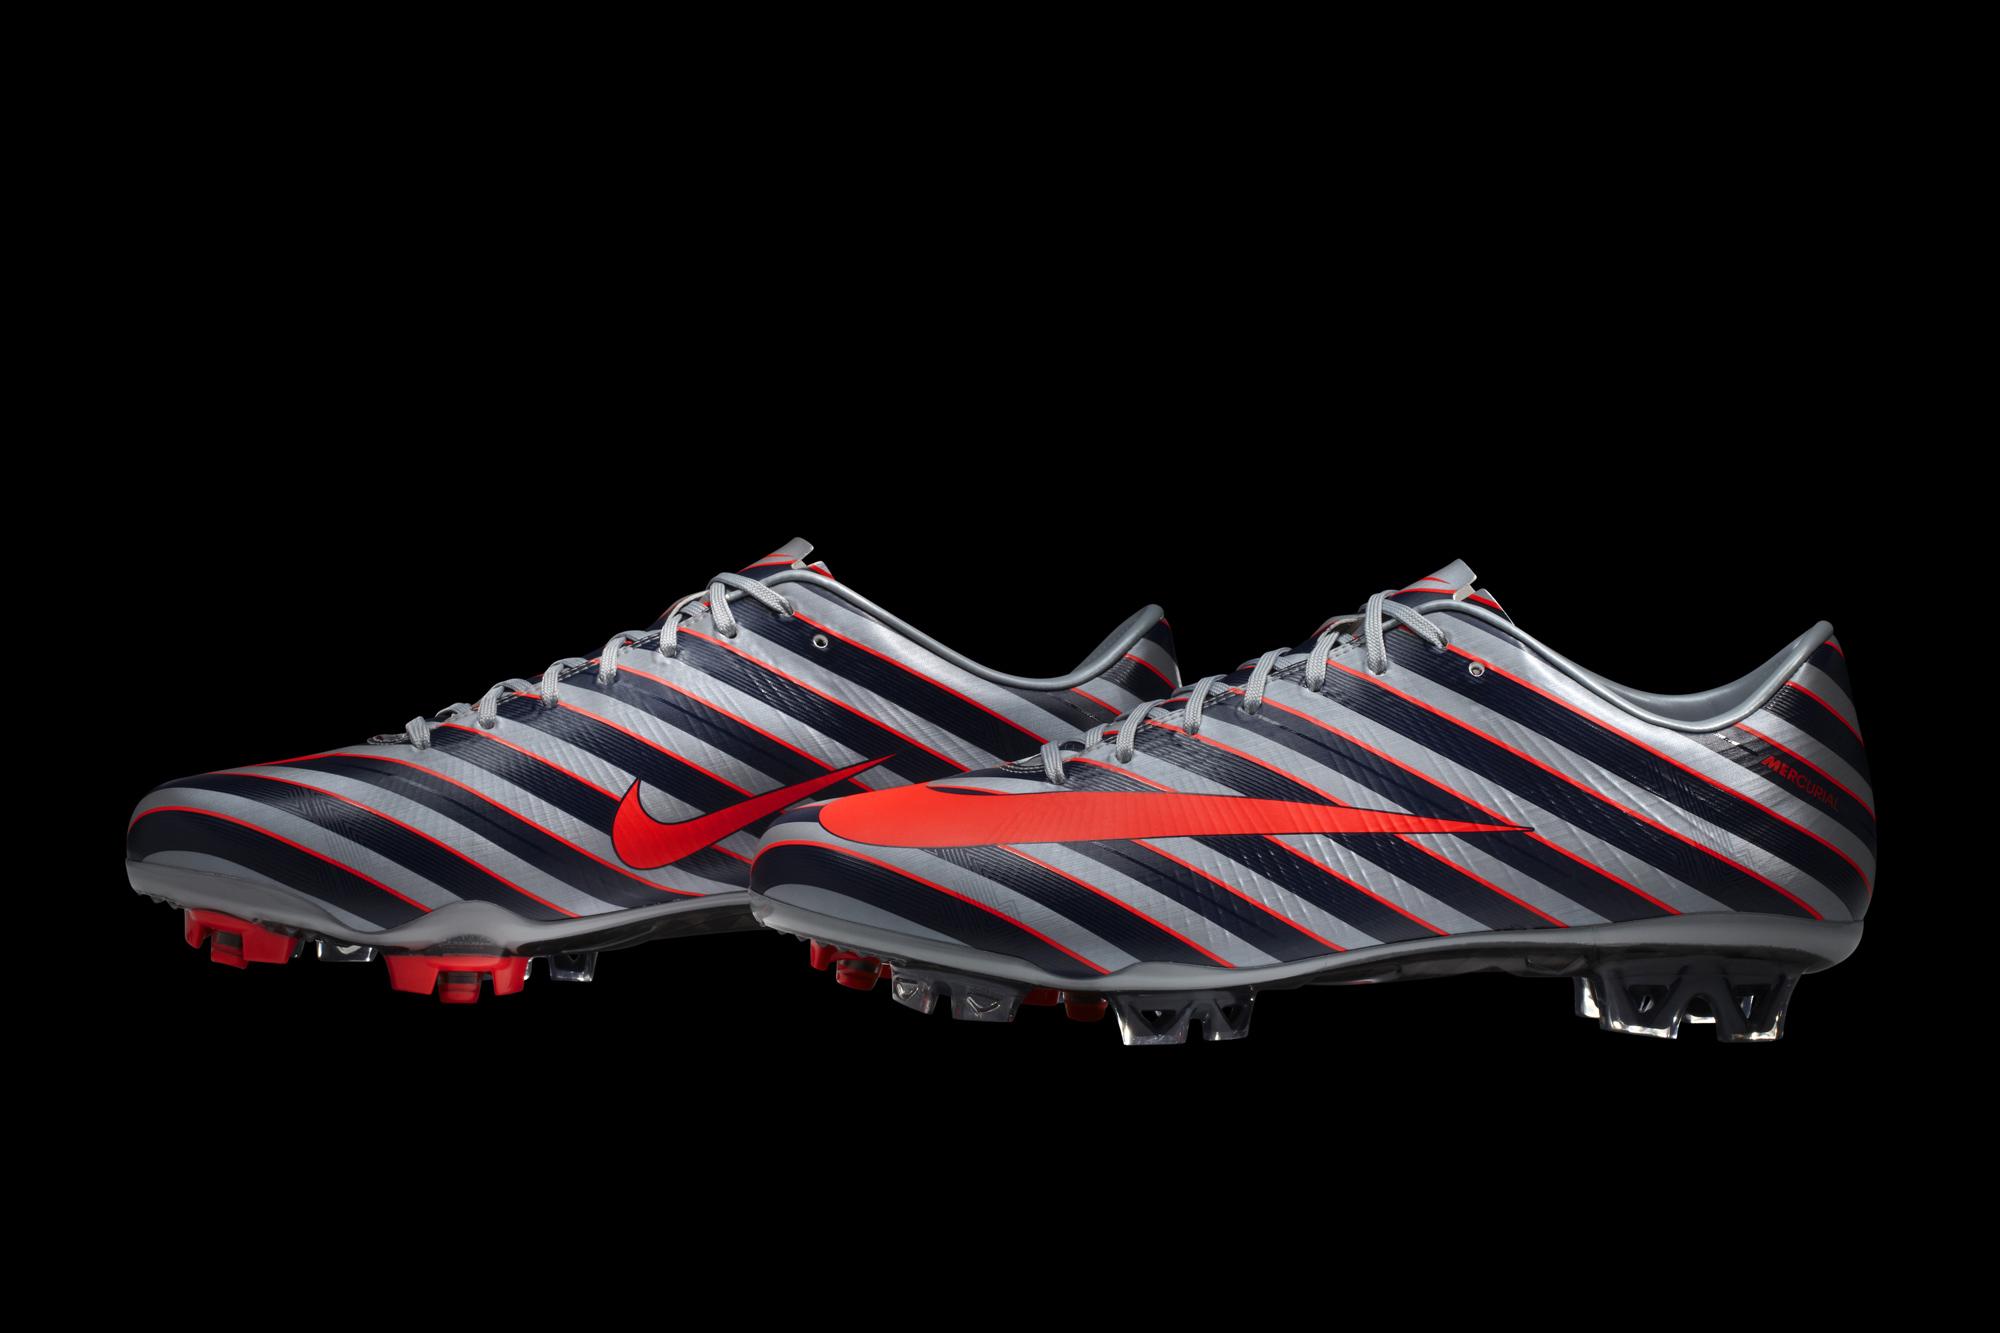 591108ff44901 ... purchase football boot release nike mercurial vapor superfly cr7 iii  e1067 e3720